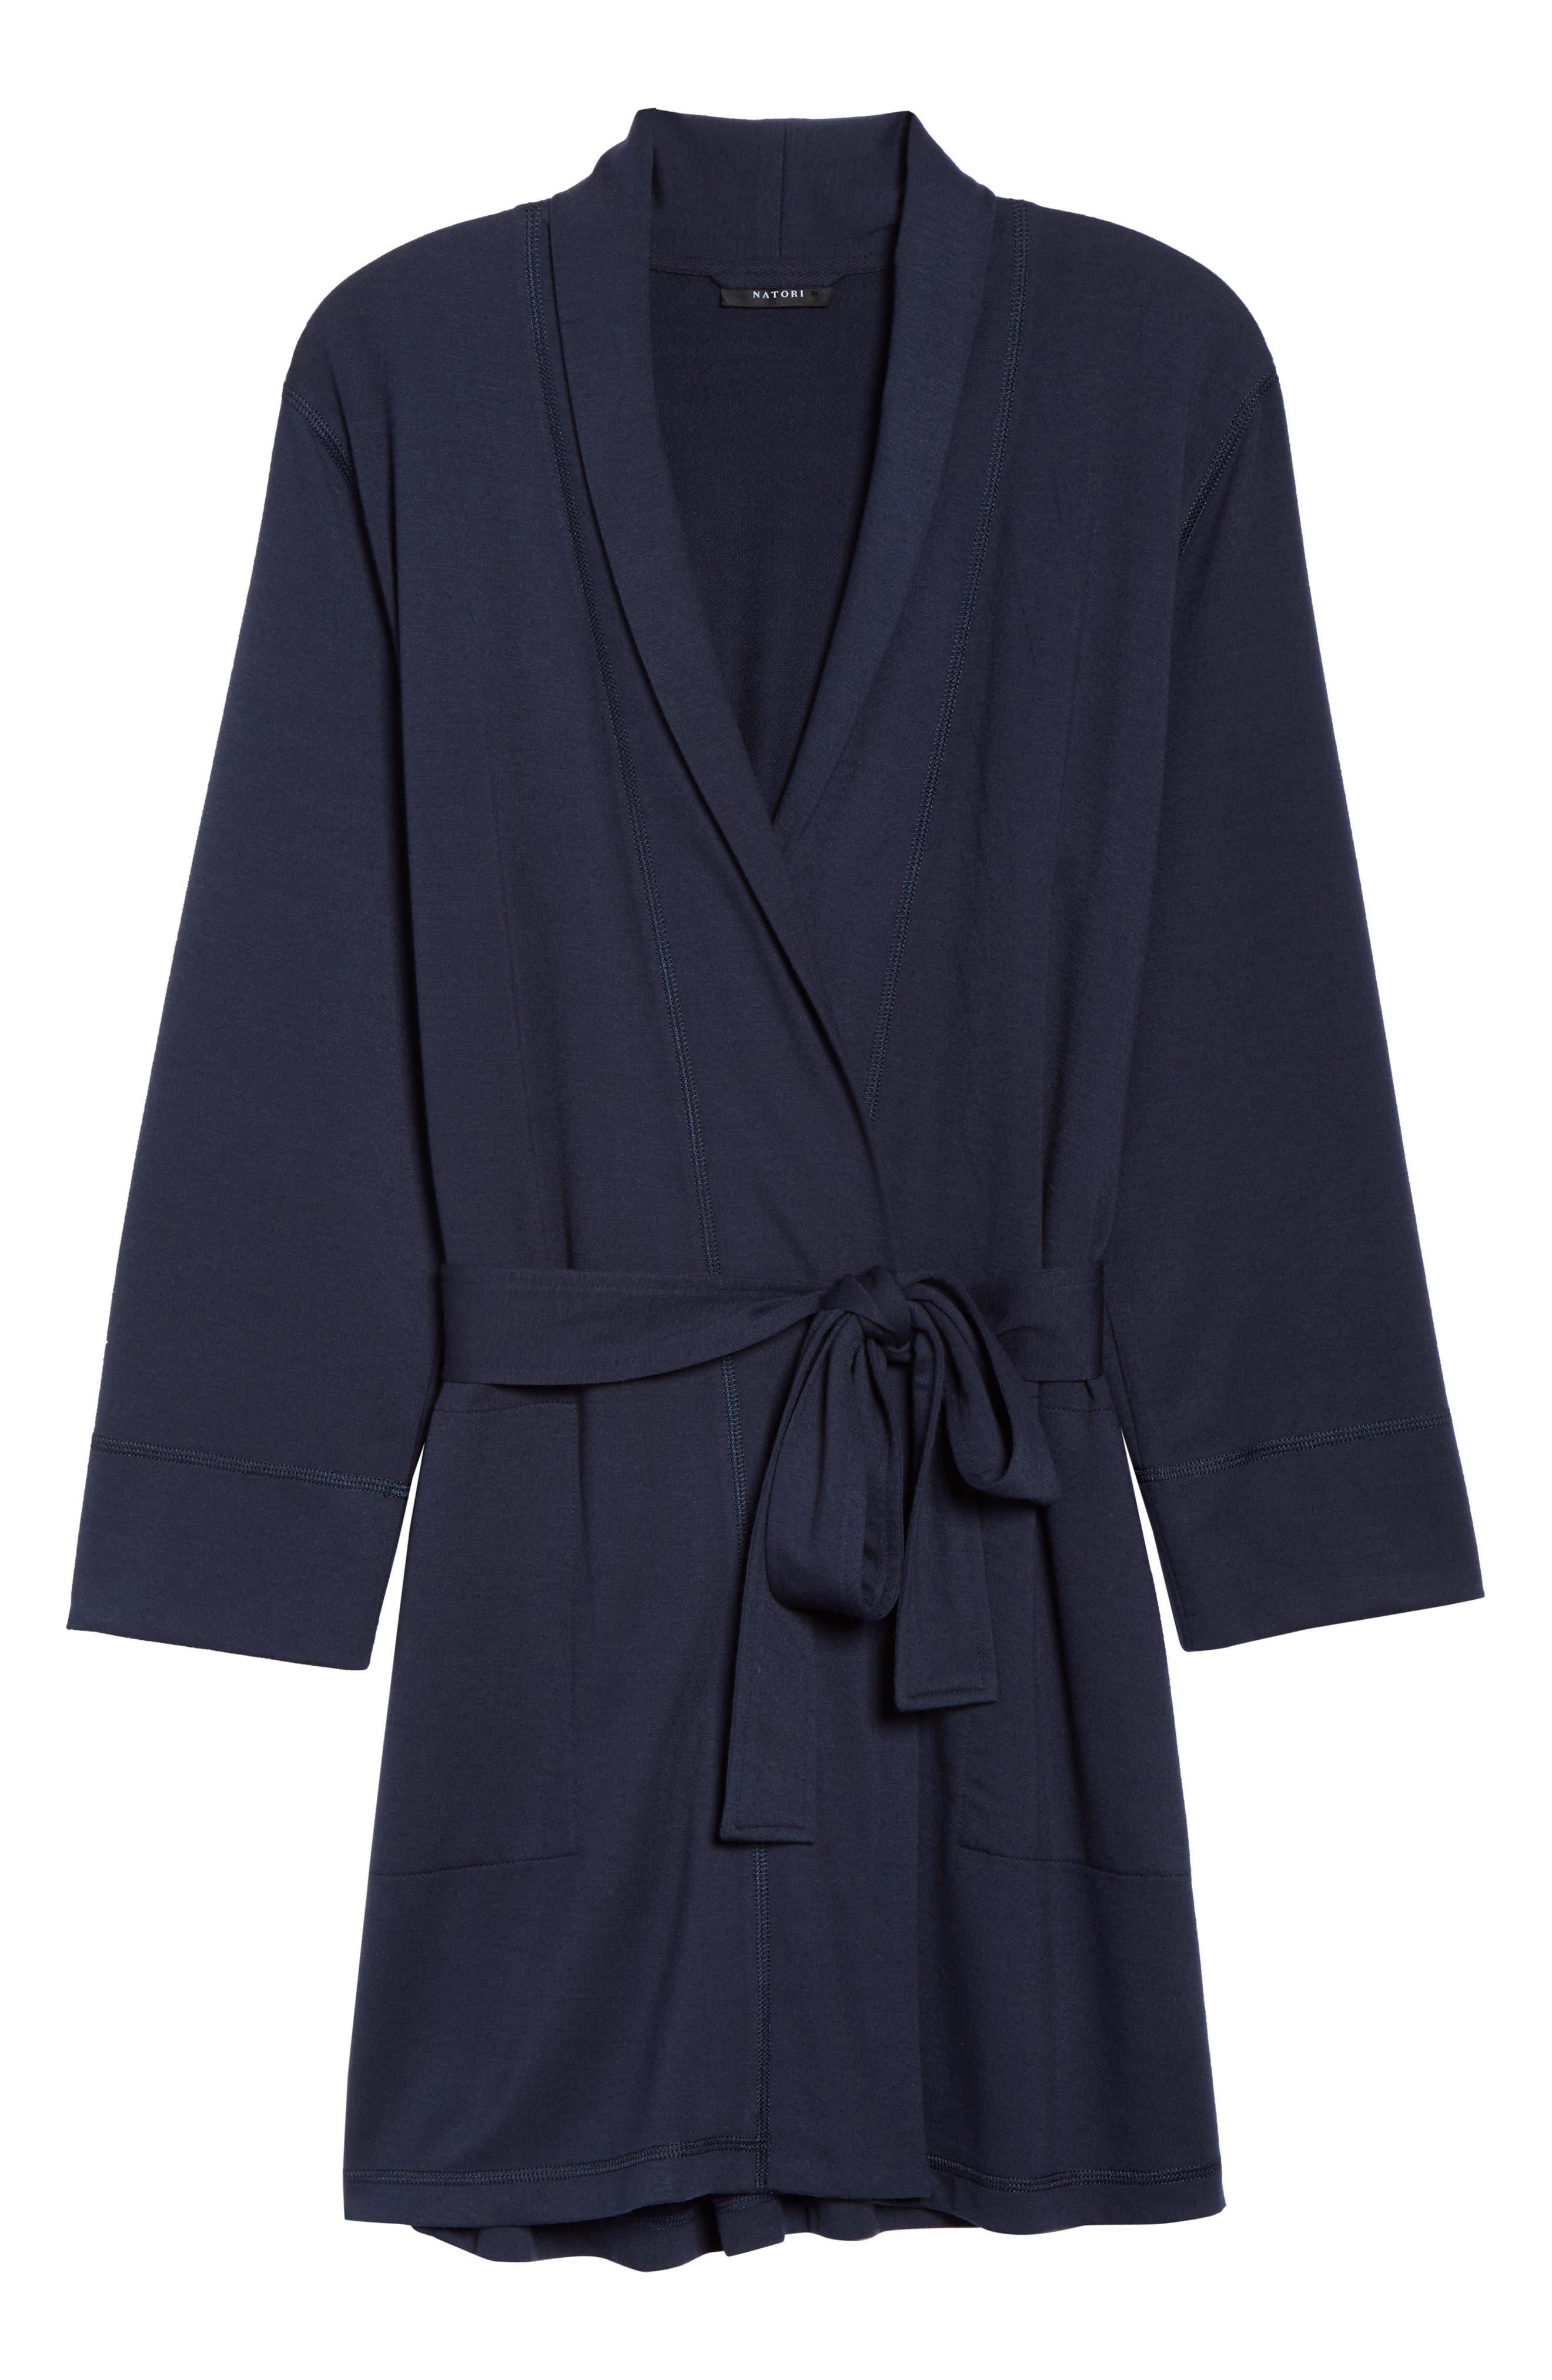 NATORI, Naya Short Robe, Alternate thumbnail 6, color, NIGHT BLUE